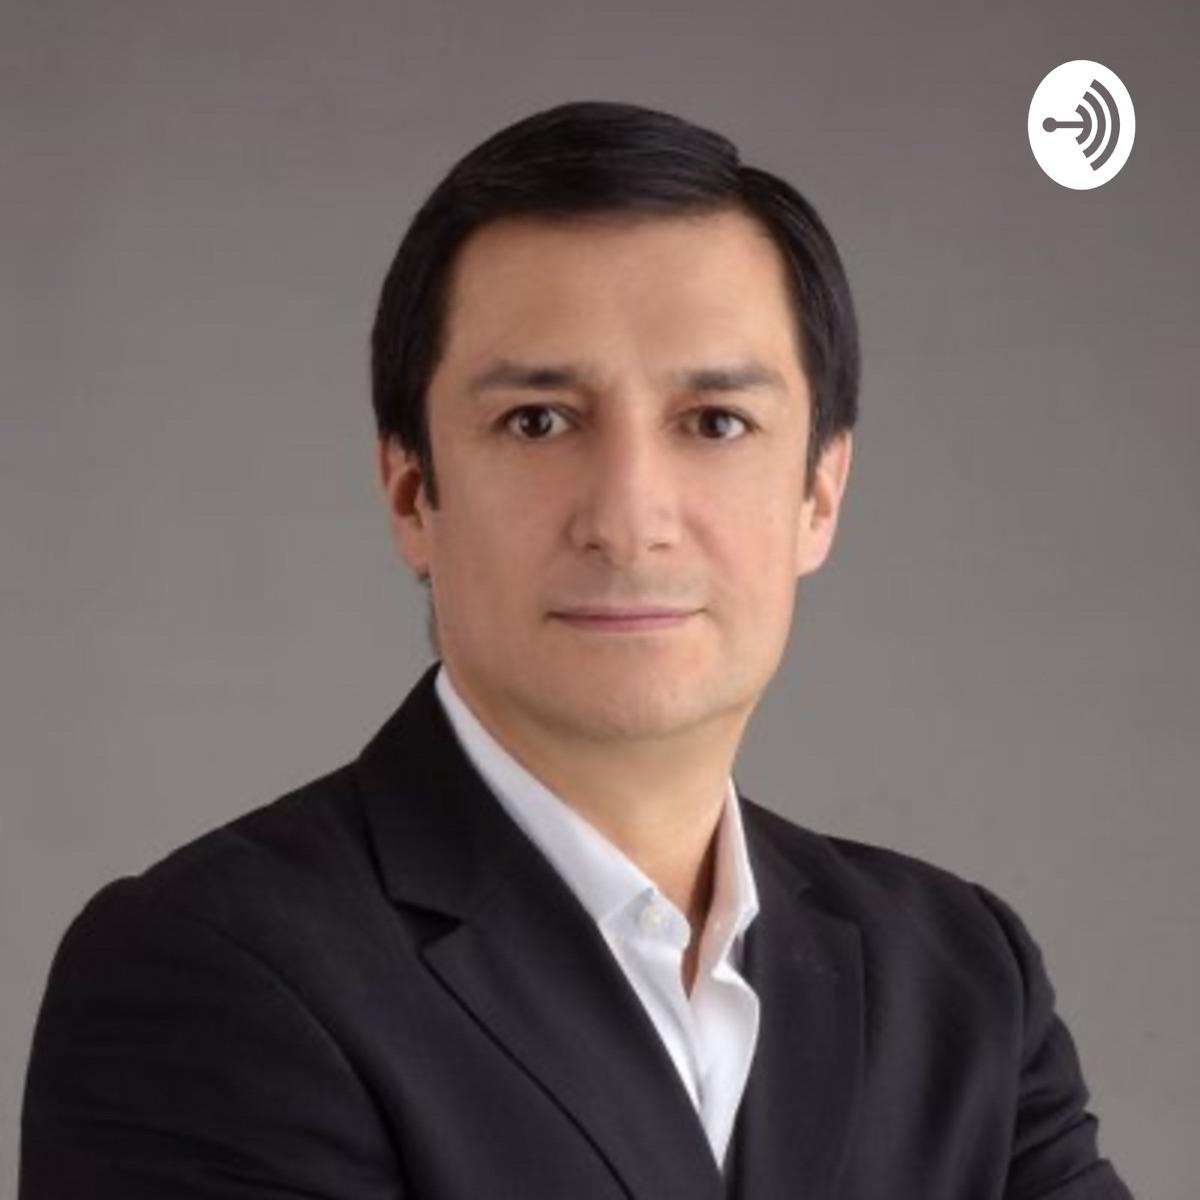 Cesar Fajardo